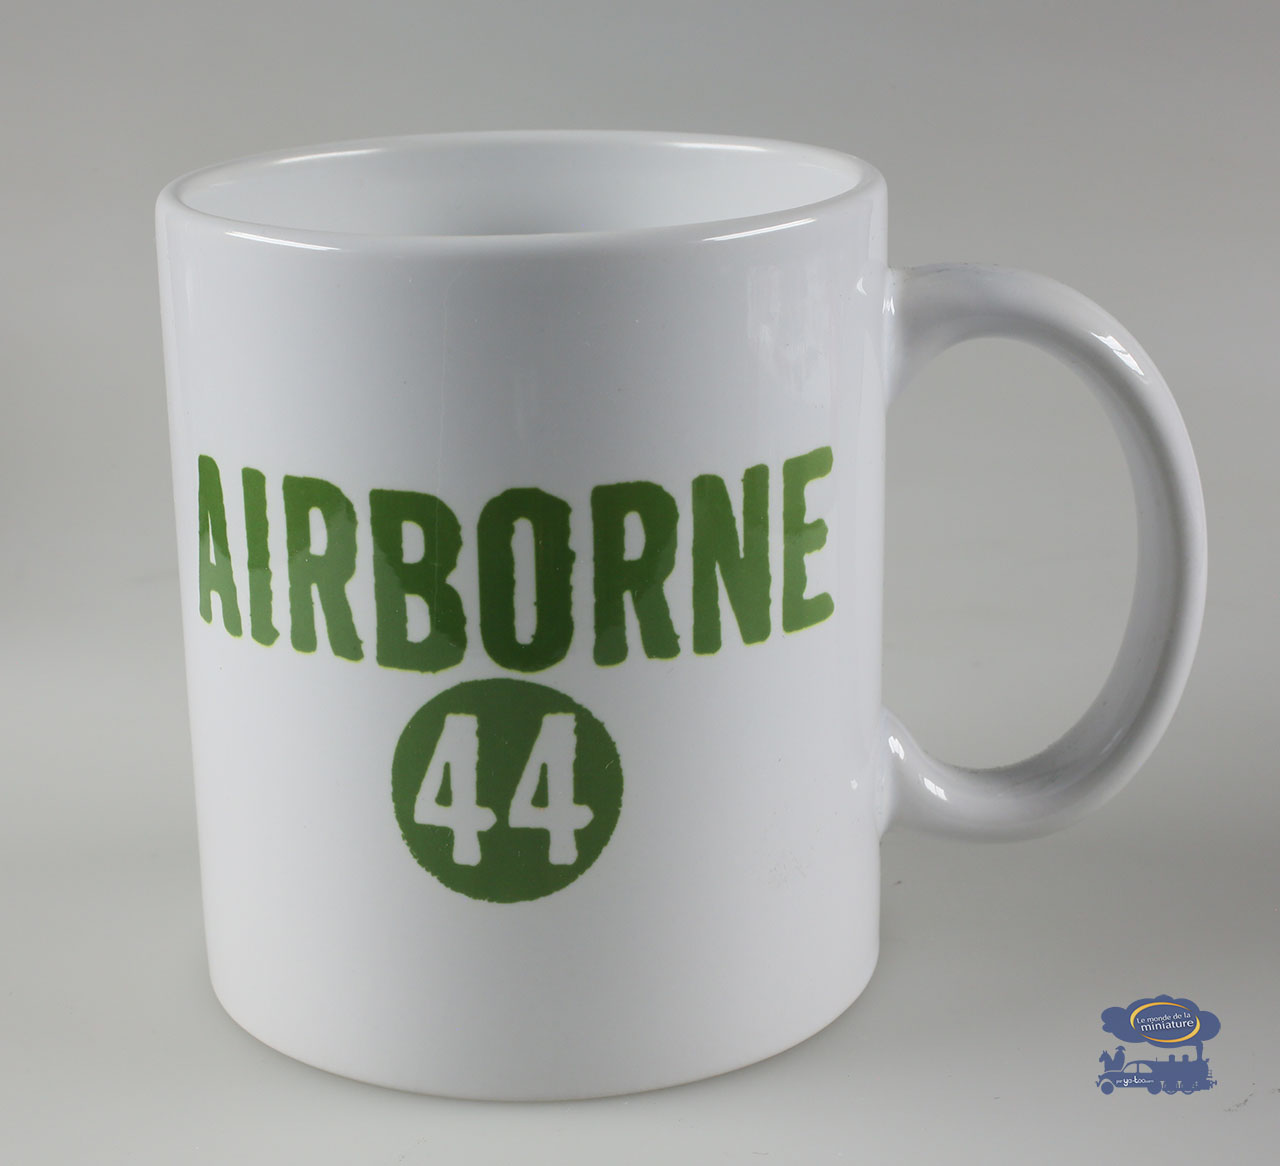 AIRBORNE 44, bataille aérienne, Mug Blanc